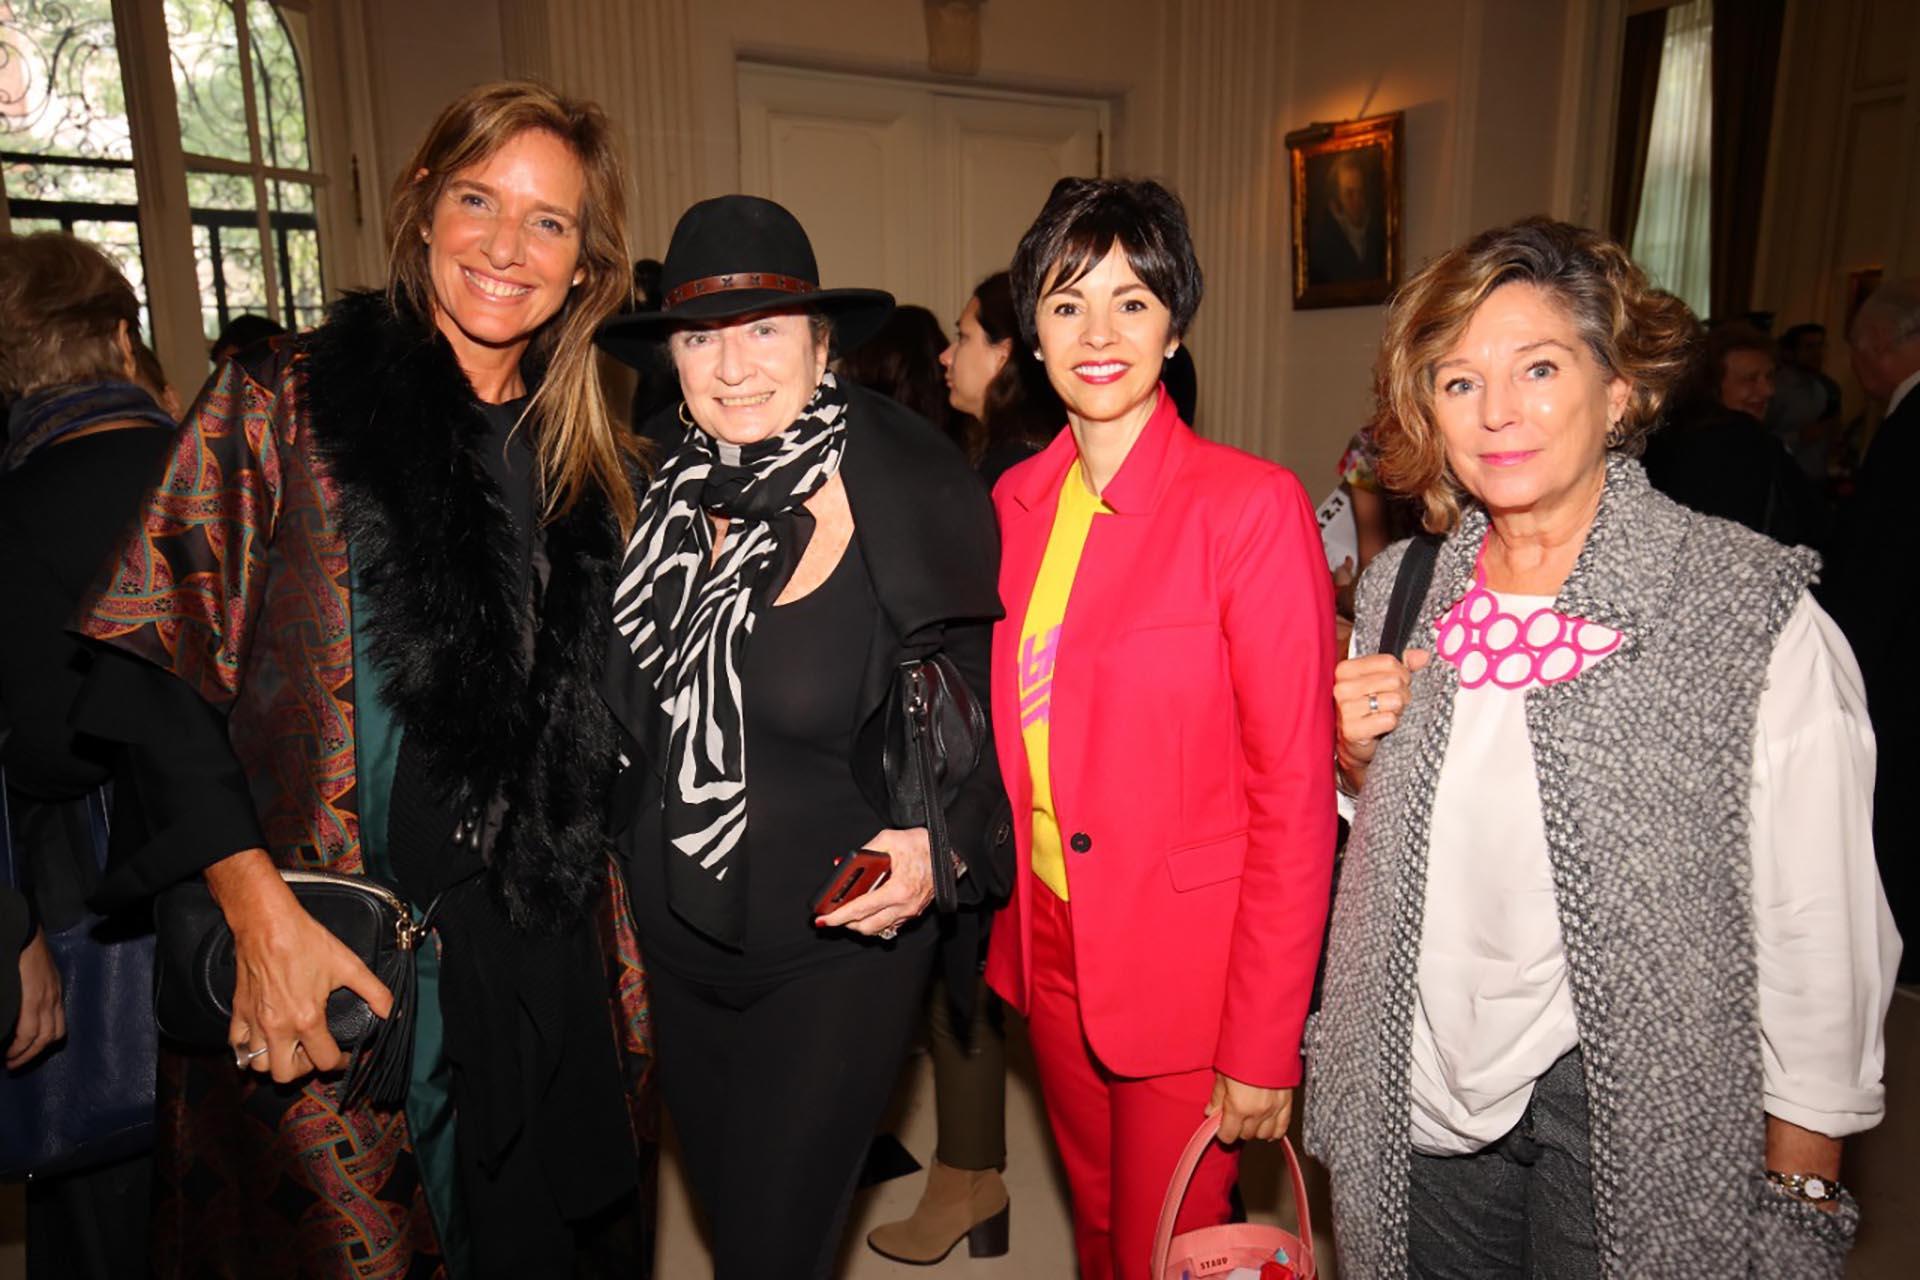 Gabriela Grobocopatel, Alicia de Arteaga, Marlise Ilhesca y Marcela Costa Peuser